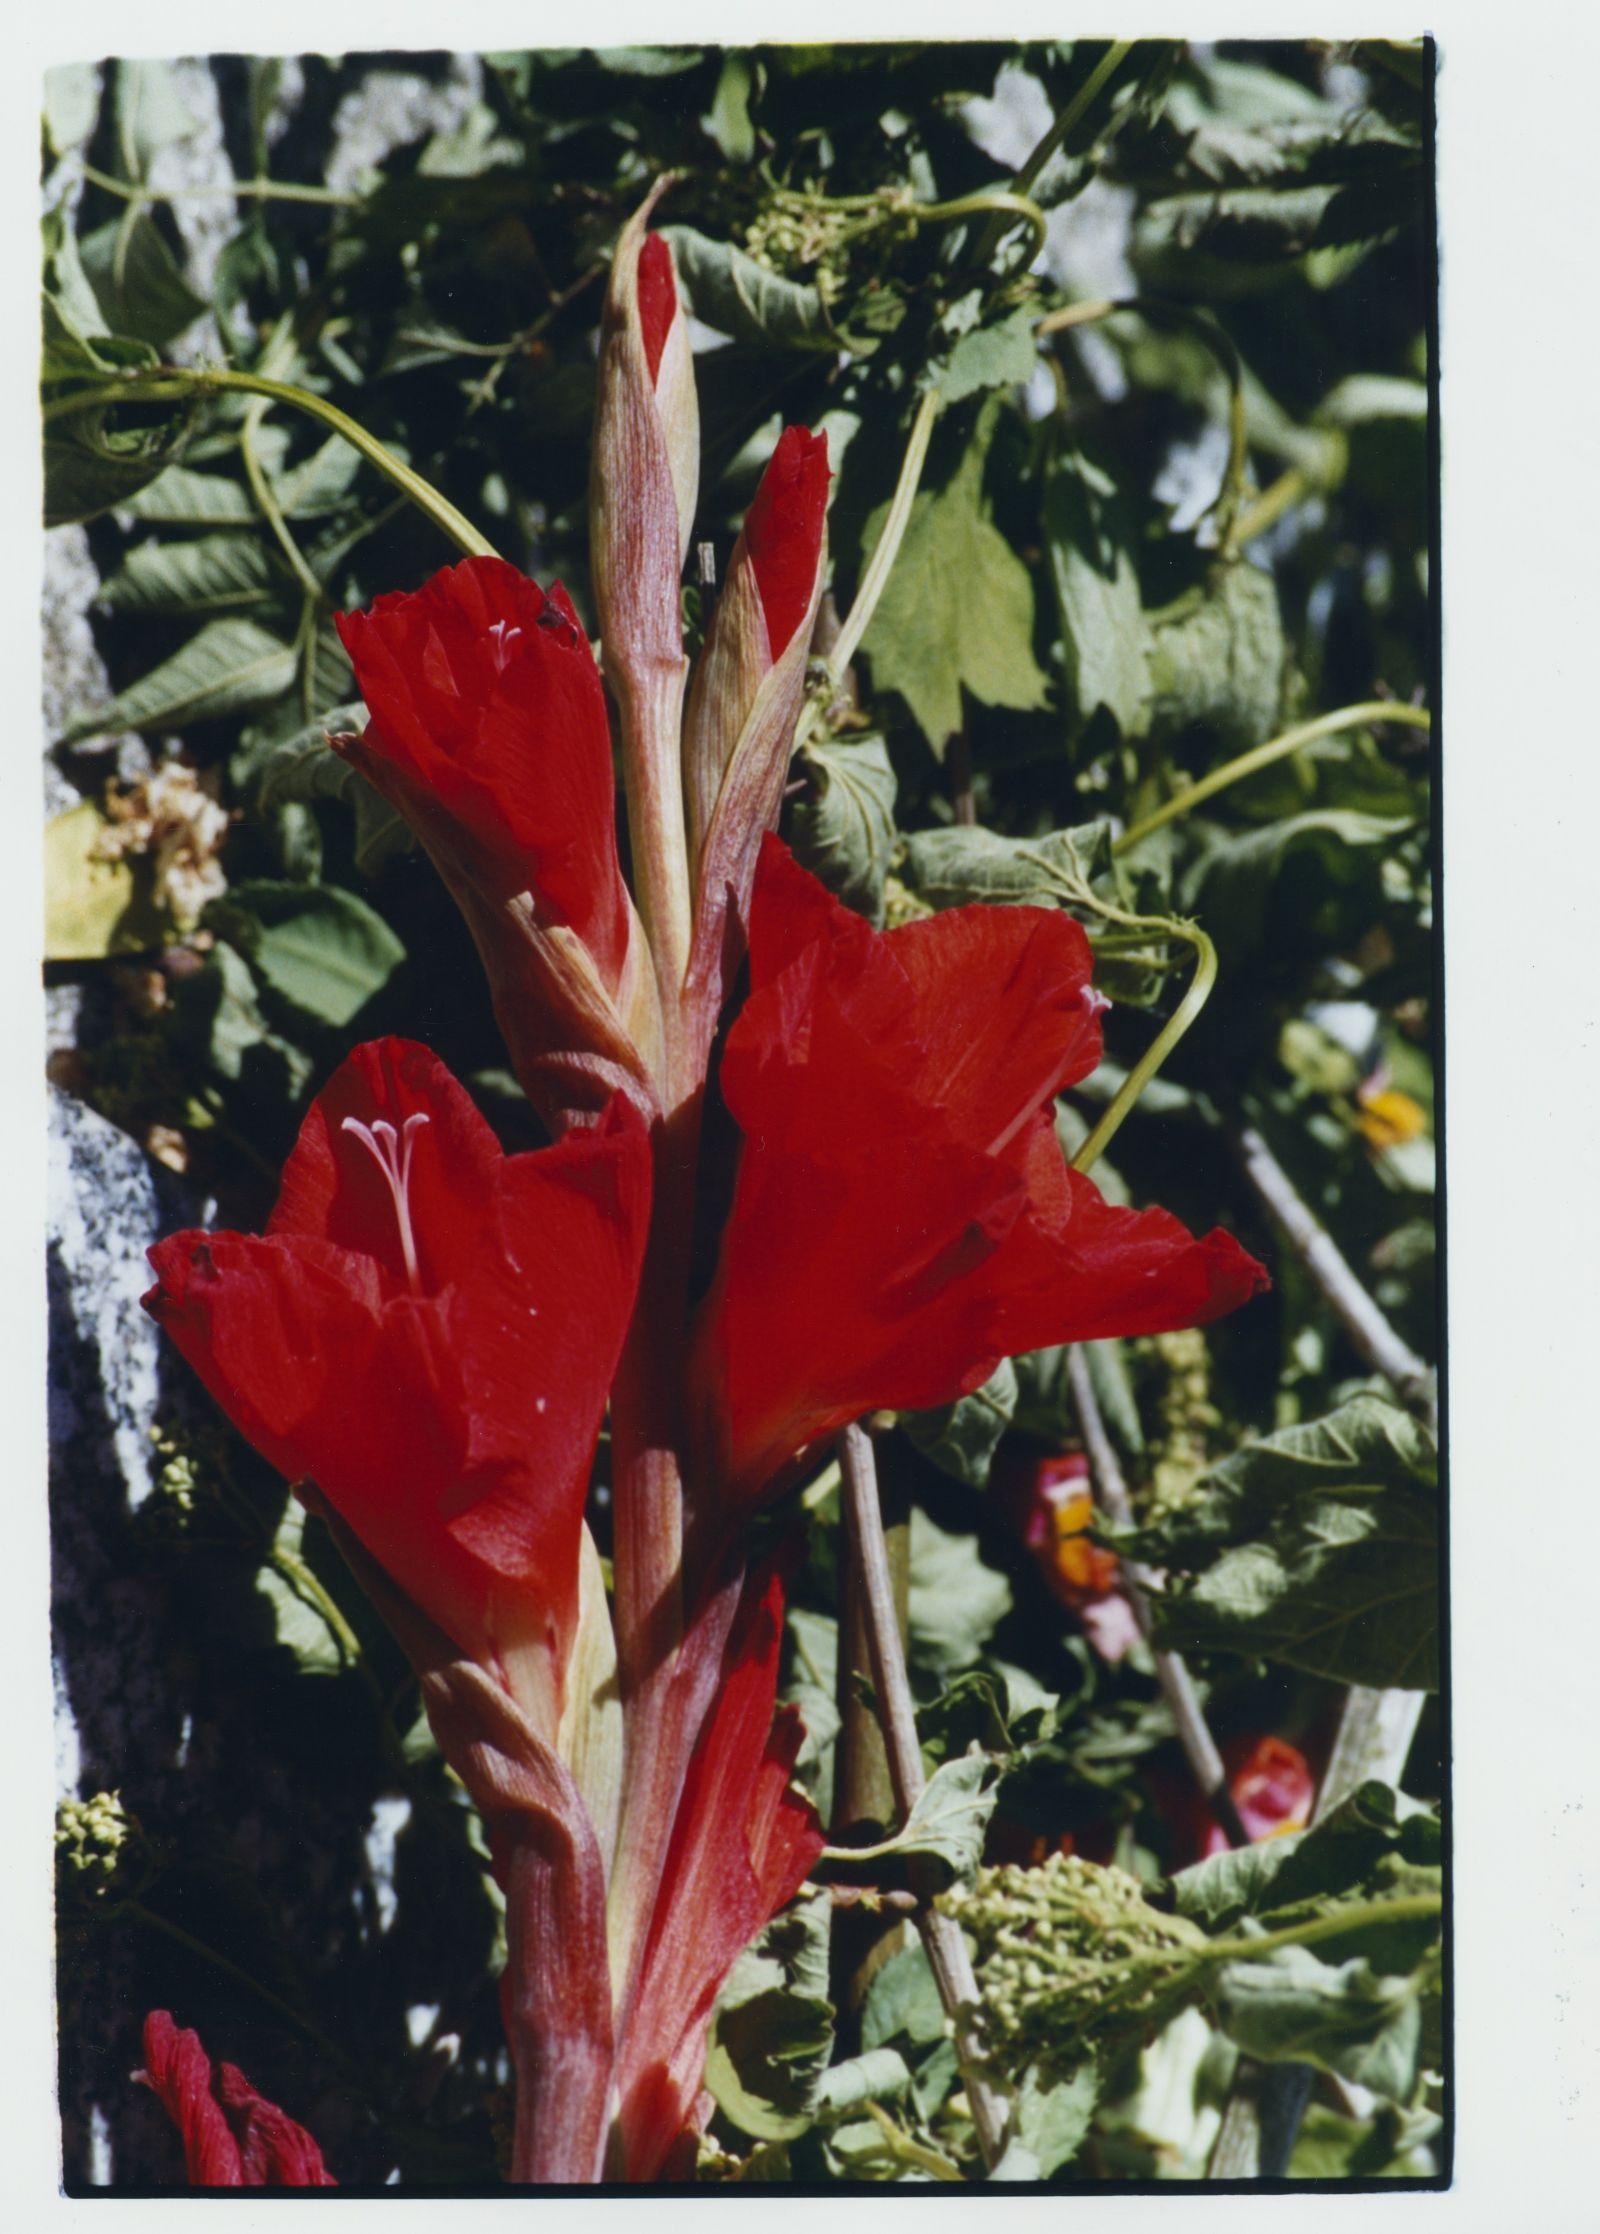 210623-visuel-expo-fleurs-rouges-7d50b0577bc02e6b45cd7e35b43d0a16